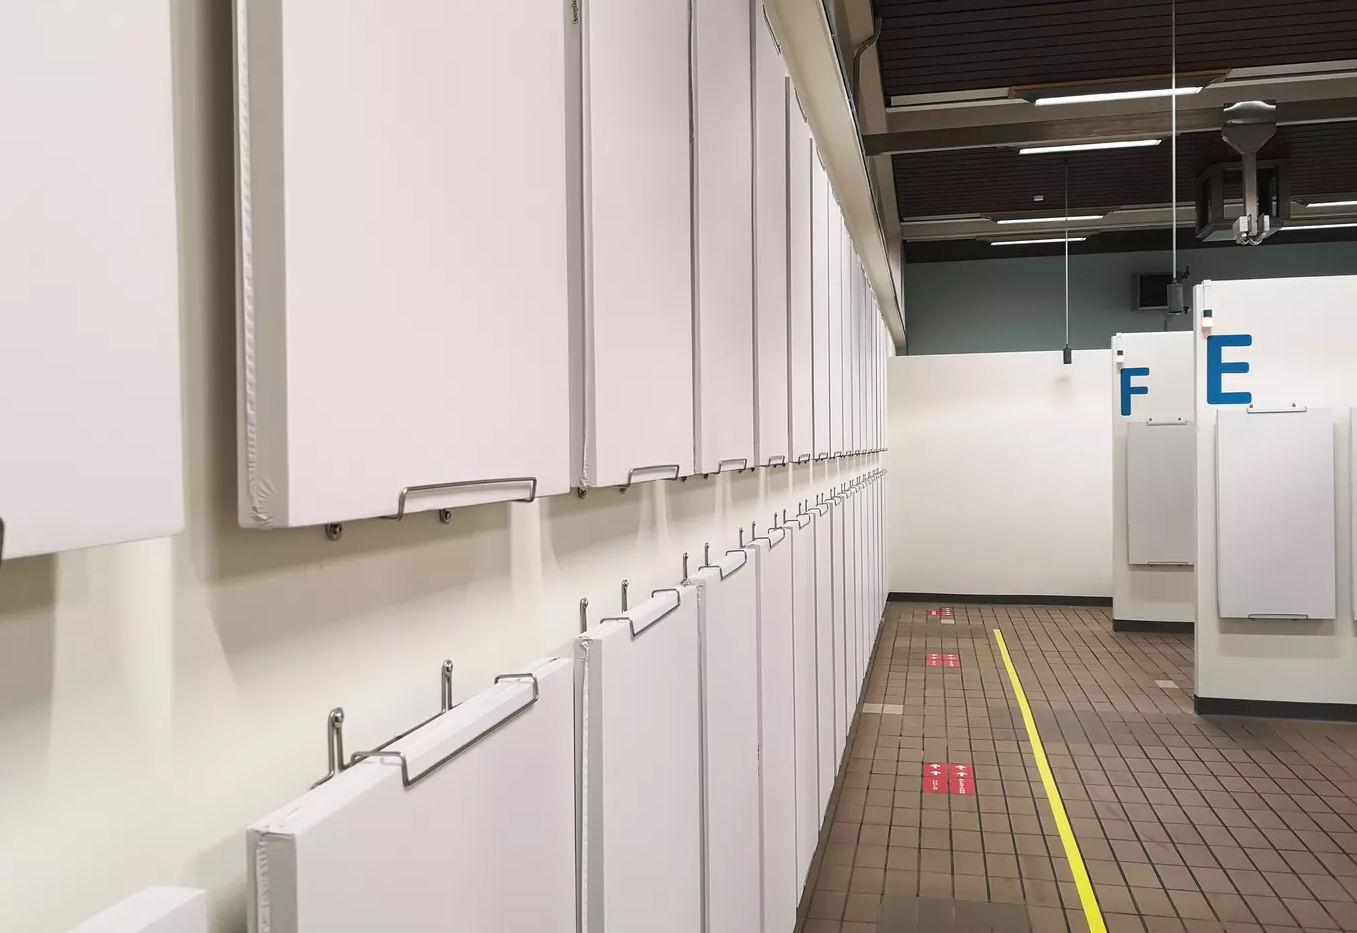 Akustik hos Roskilde covid-19 testcenter